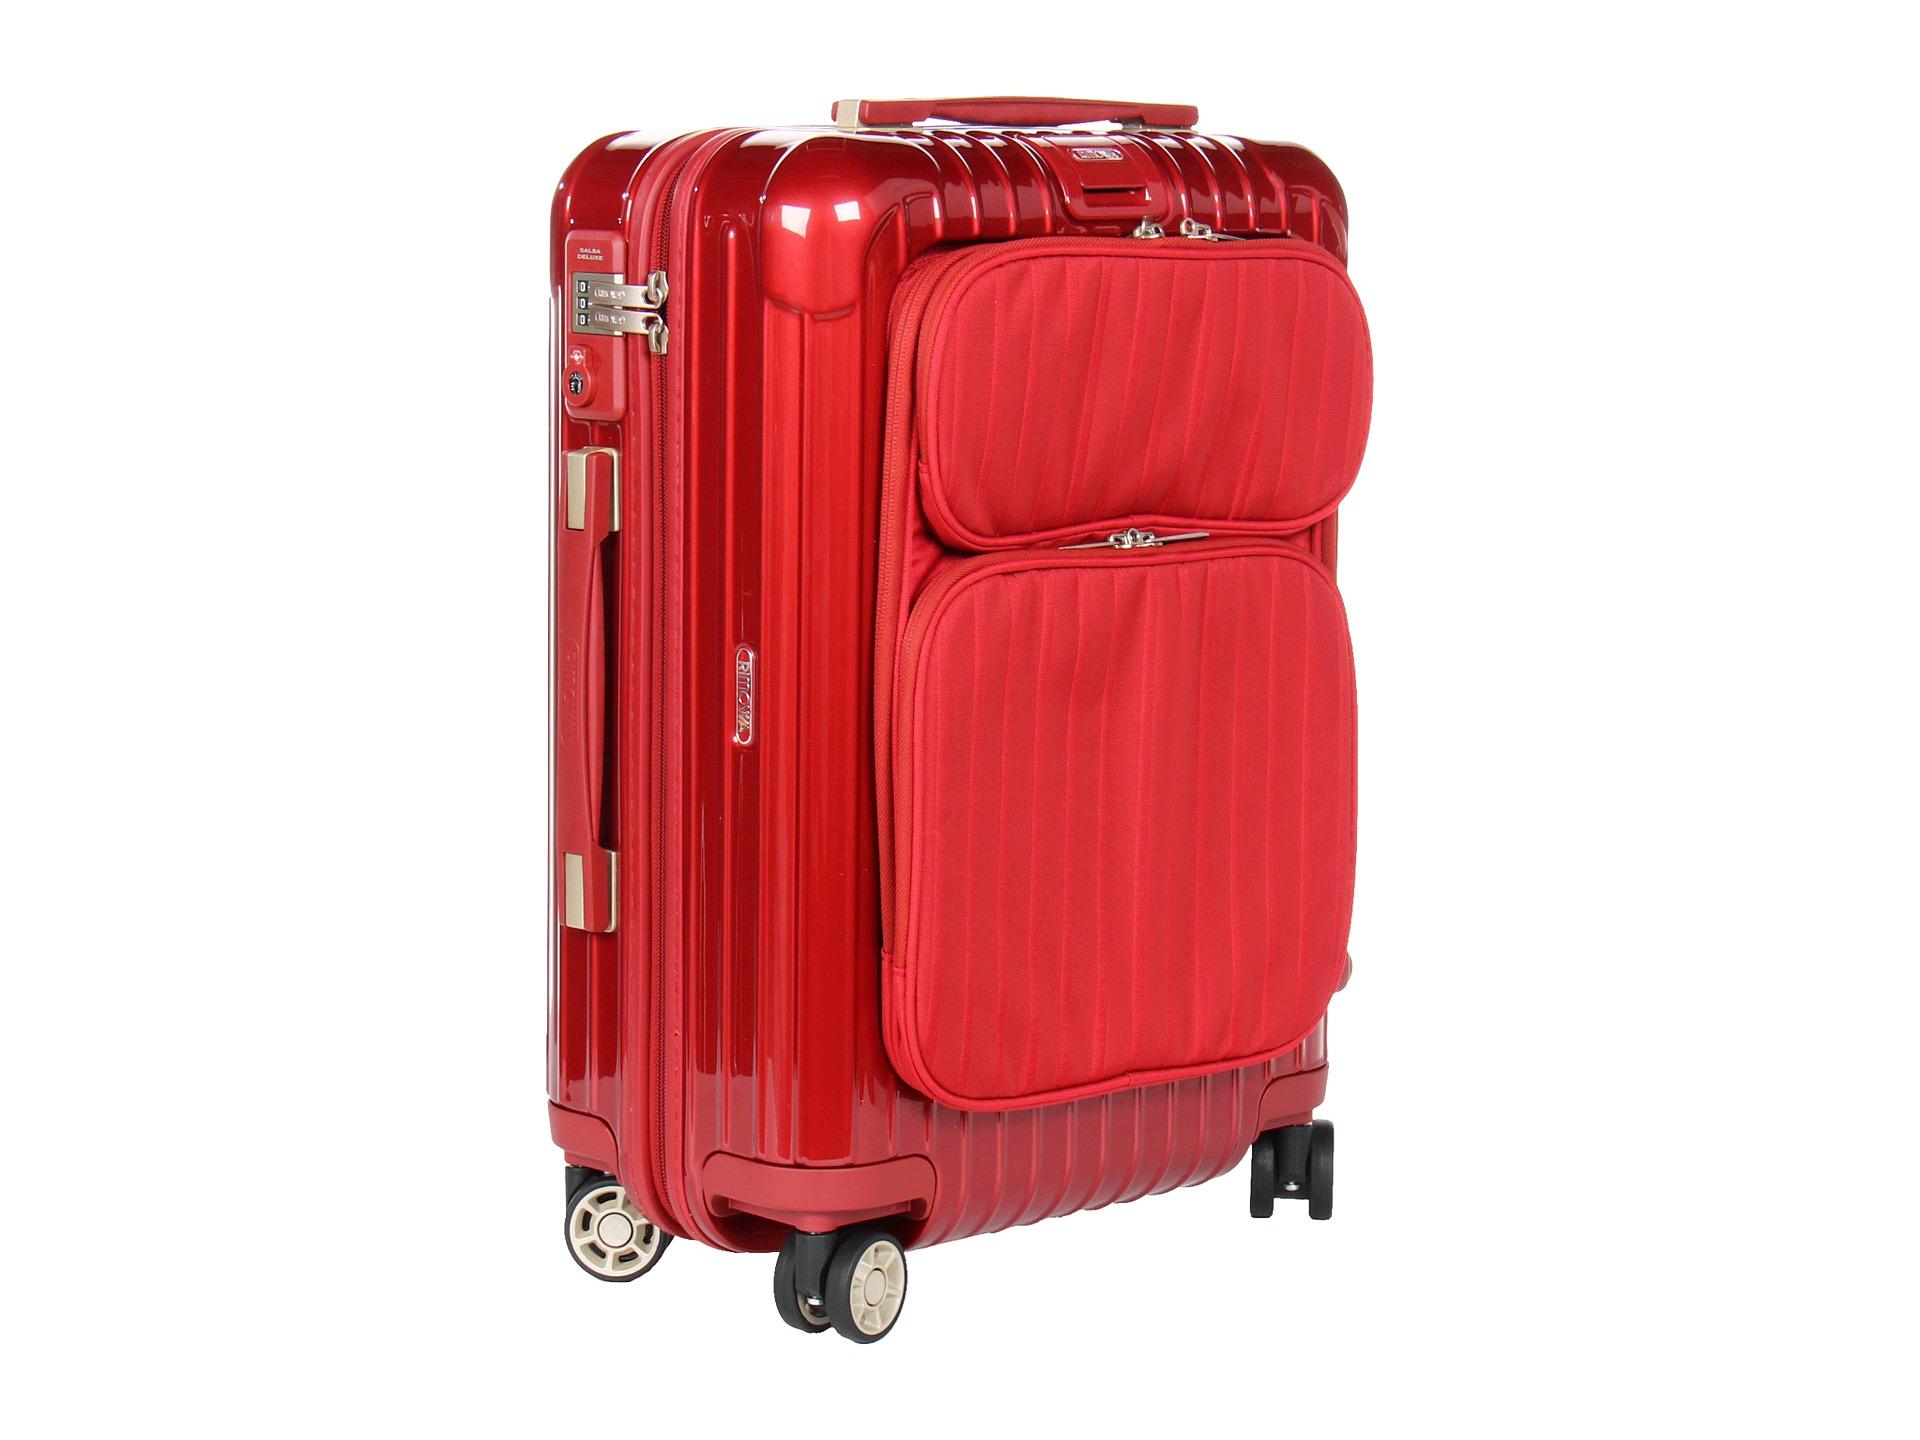 Rimowa salsa deluxe hybrid 21 cabin multiwheel at for Salsa deluxe cabin multiwheel